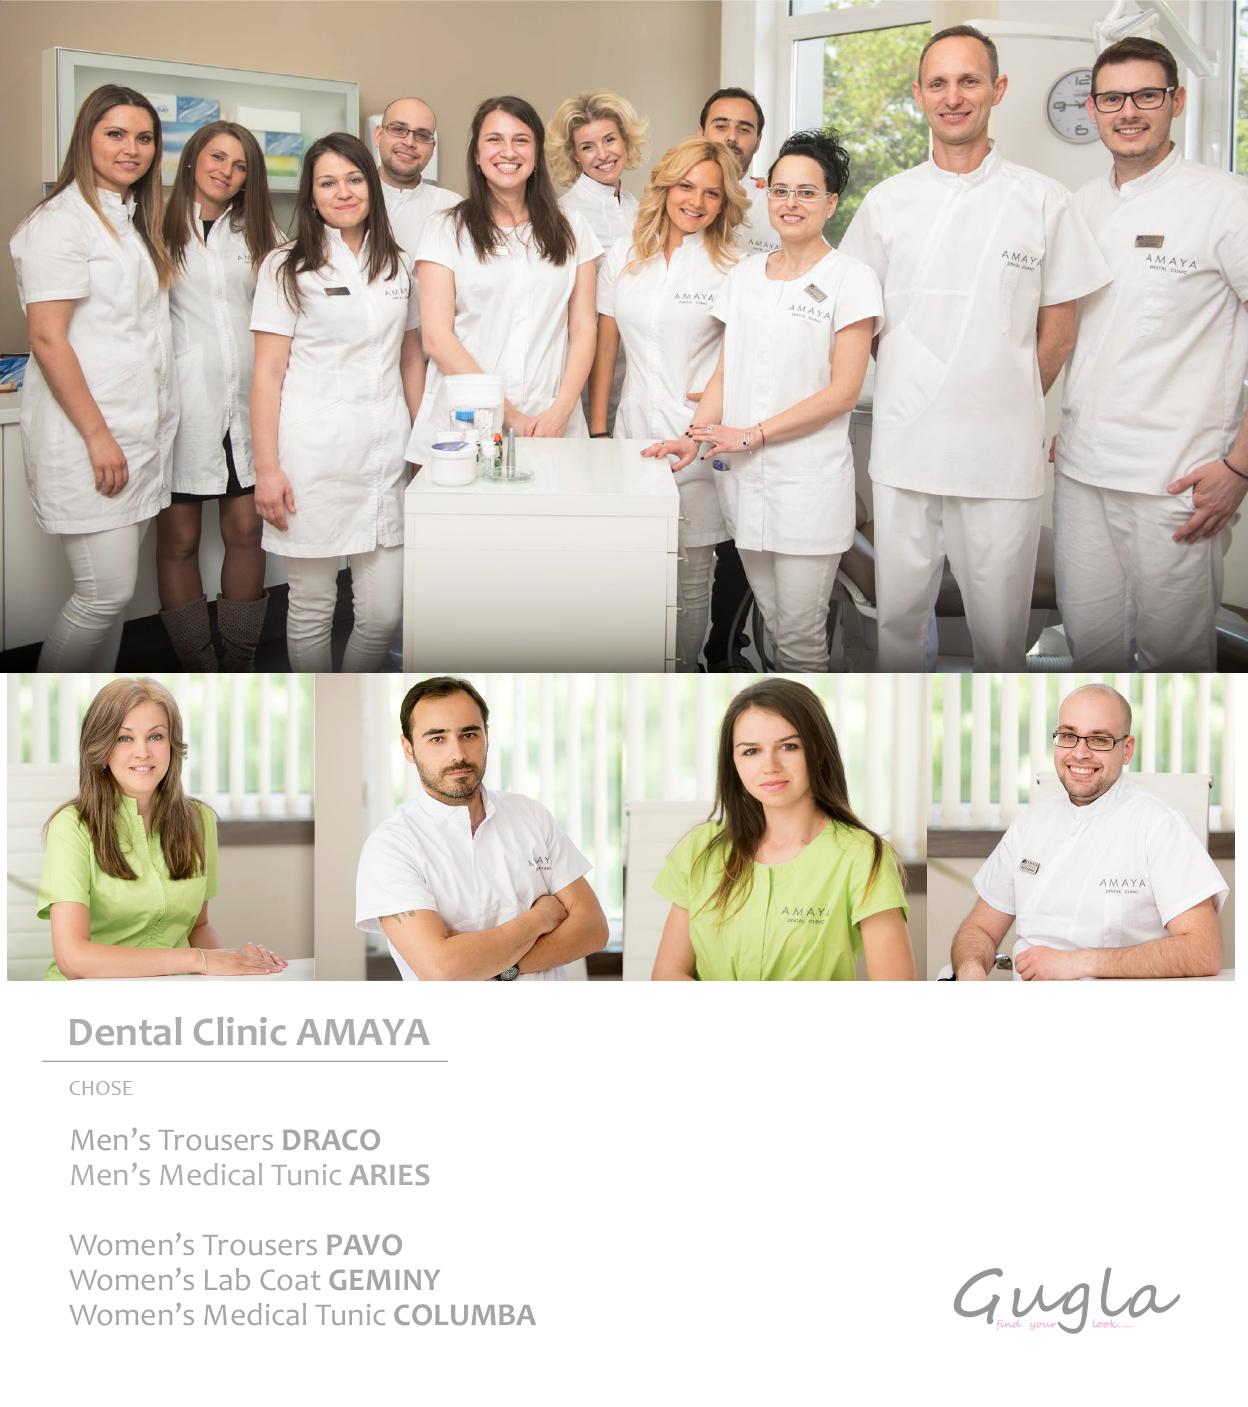 Dental-Nurse-Uniforms-By-Gugla